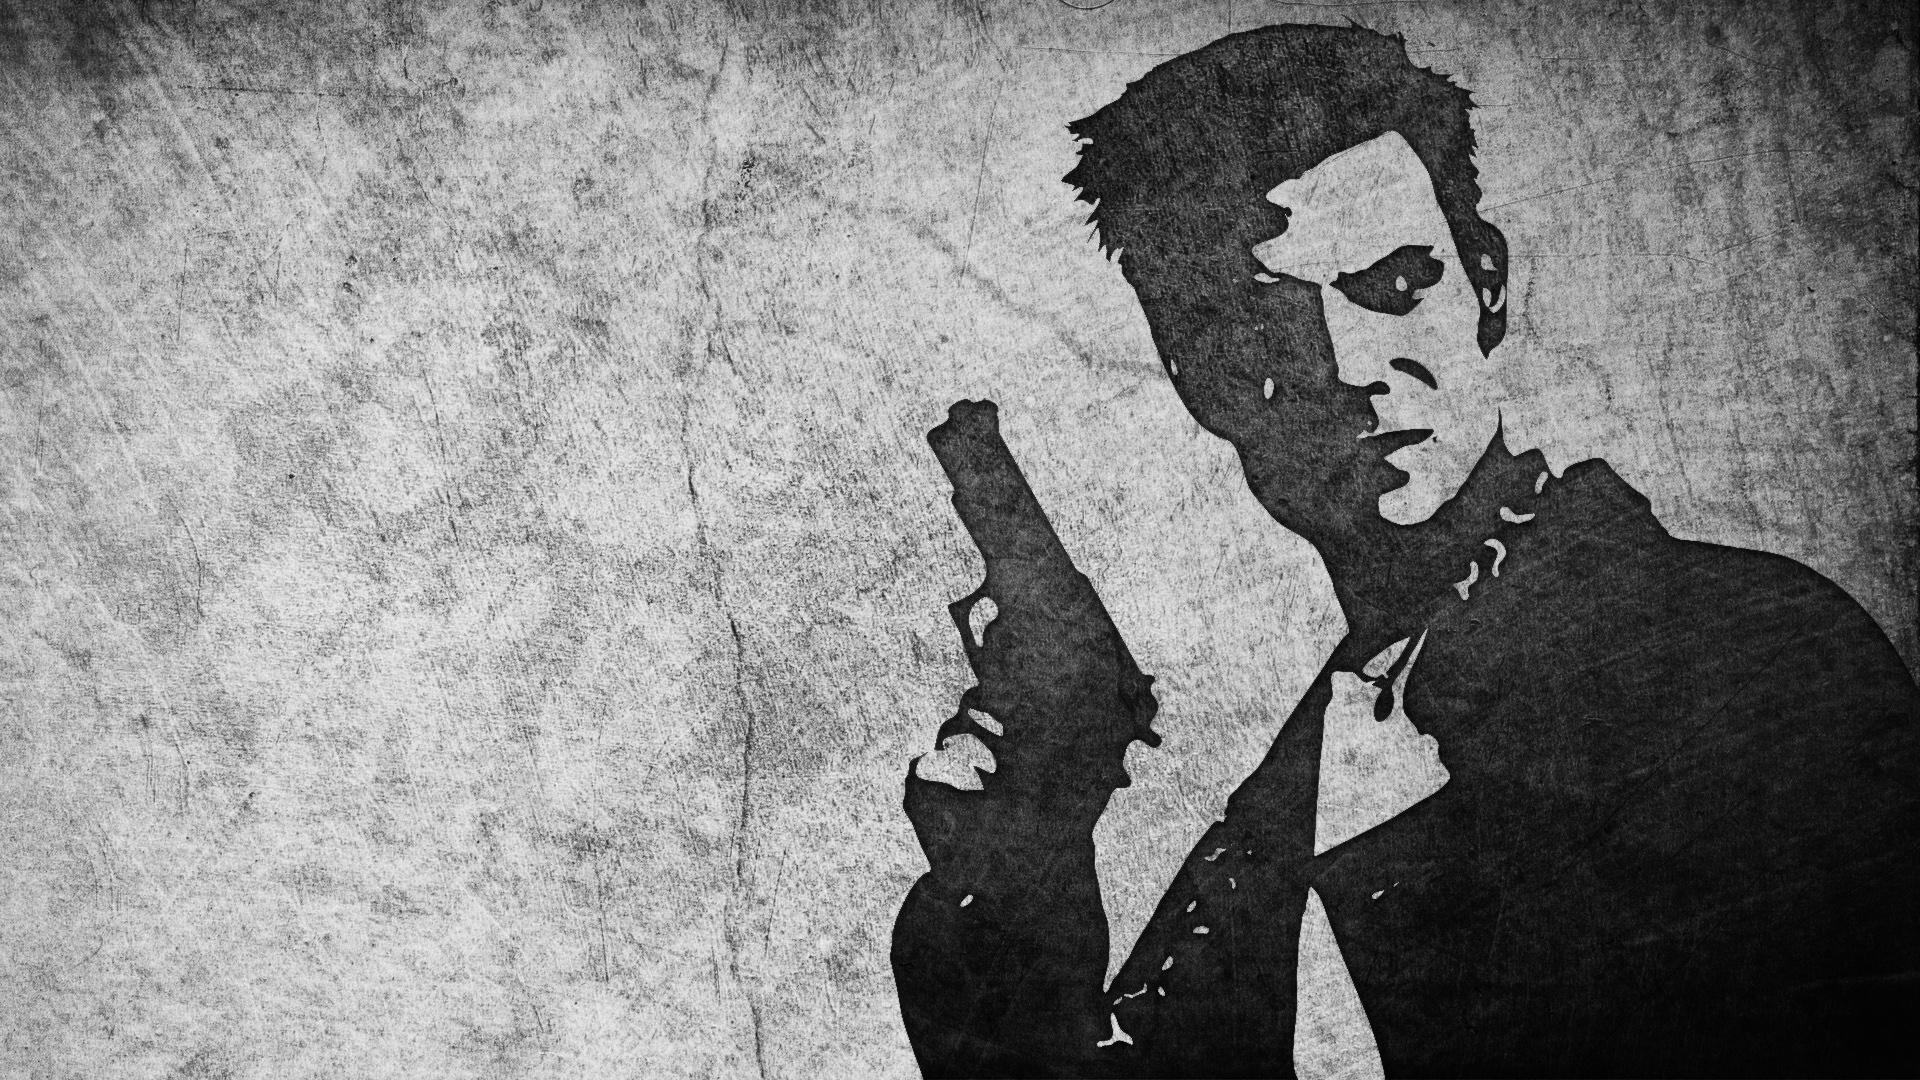 Max Payne Wallpaper by hexarrow 1920x1080